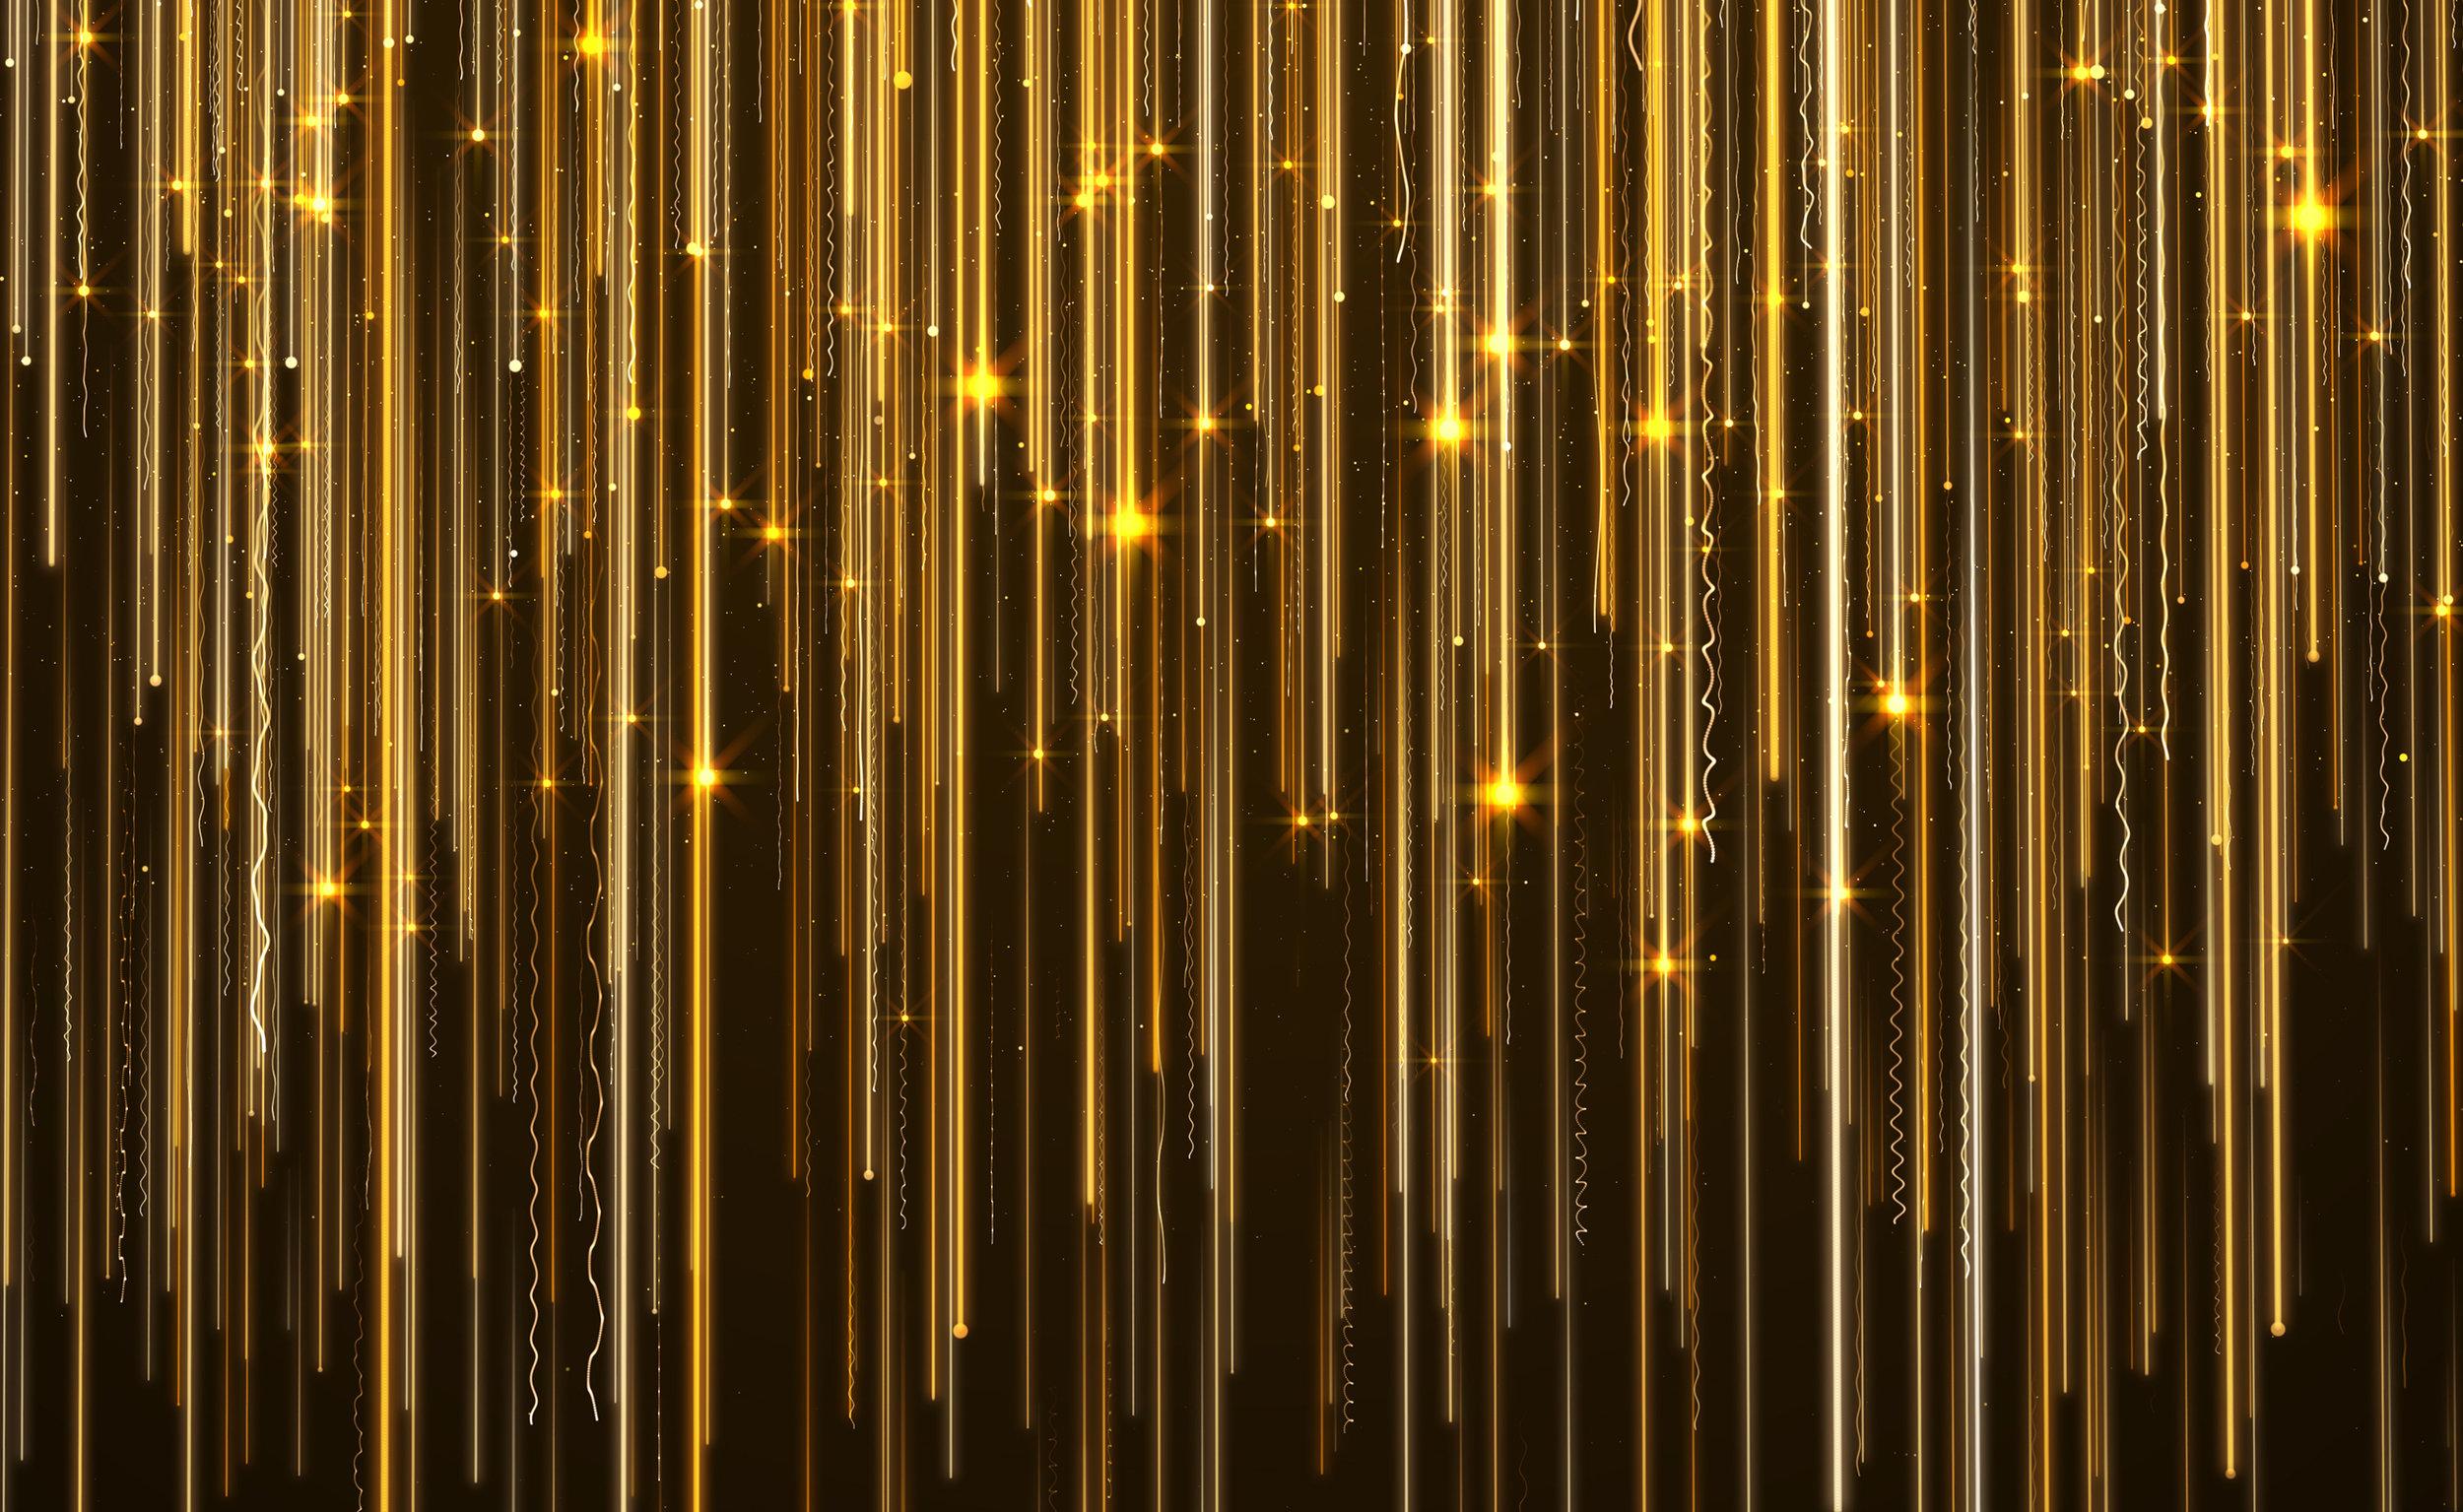 DRIPPING IN GOLD   Music by Matt Hahn,Battery by Chris Cruz-Vargas